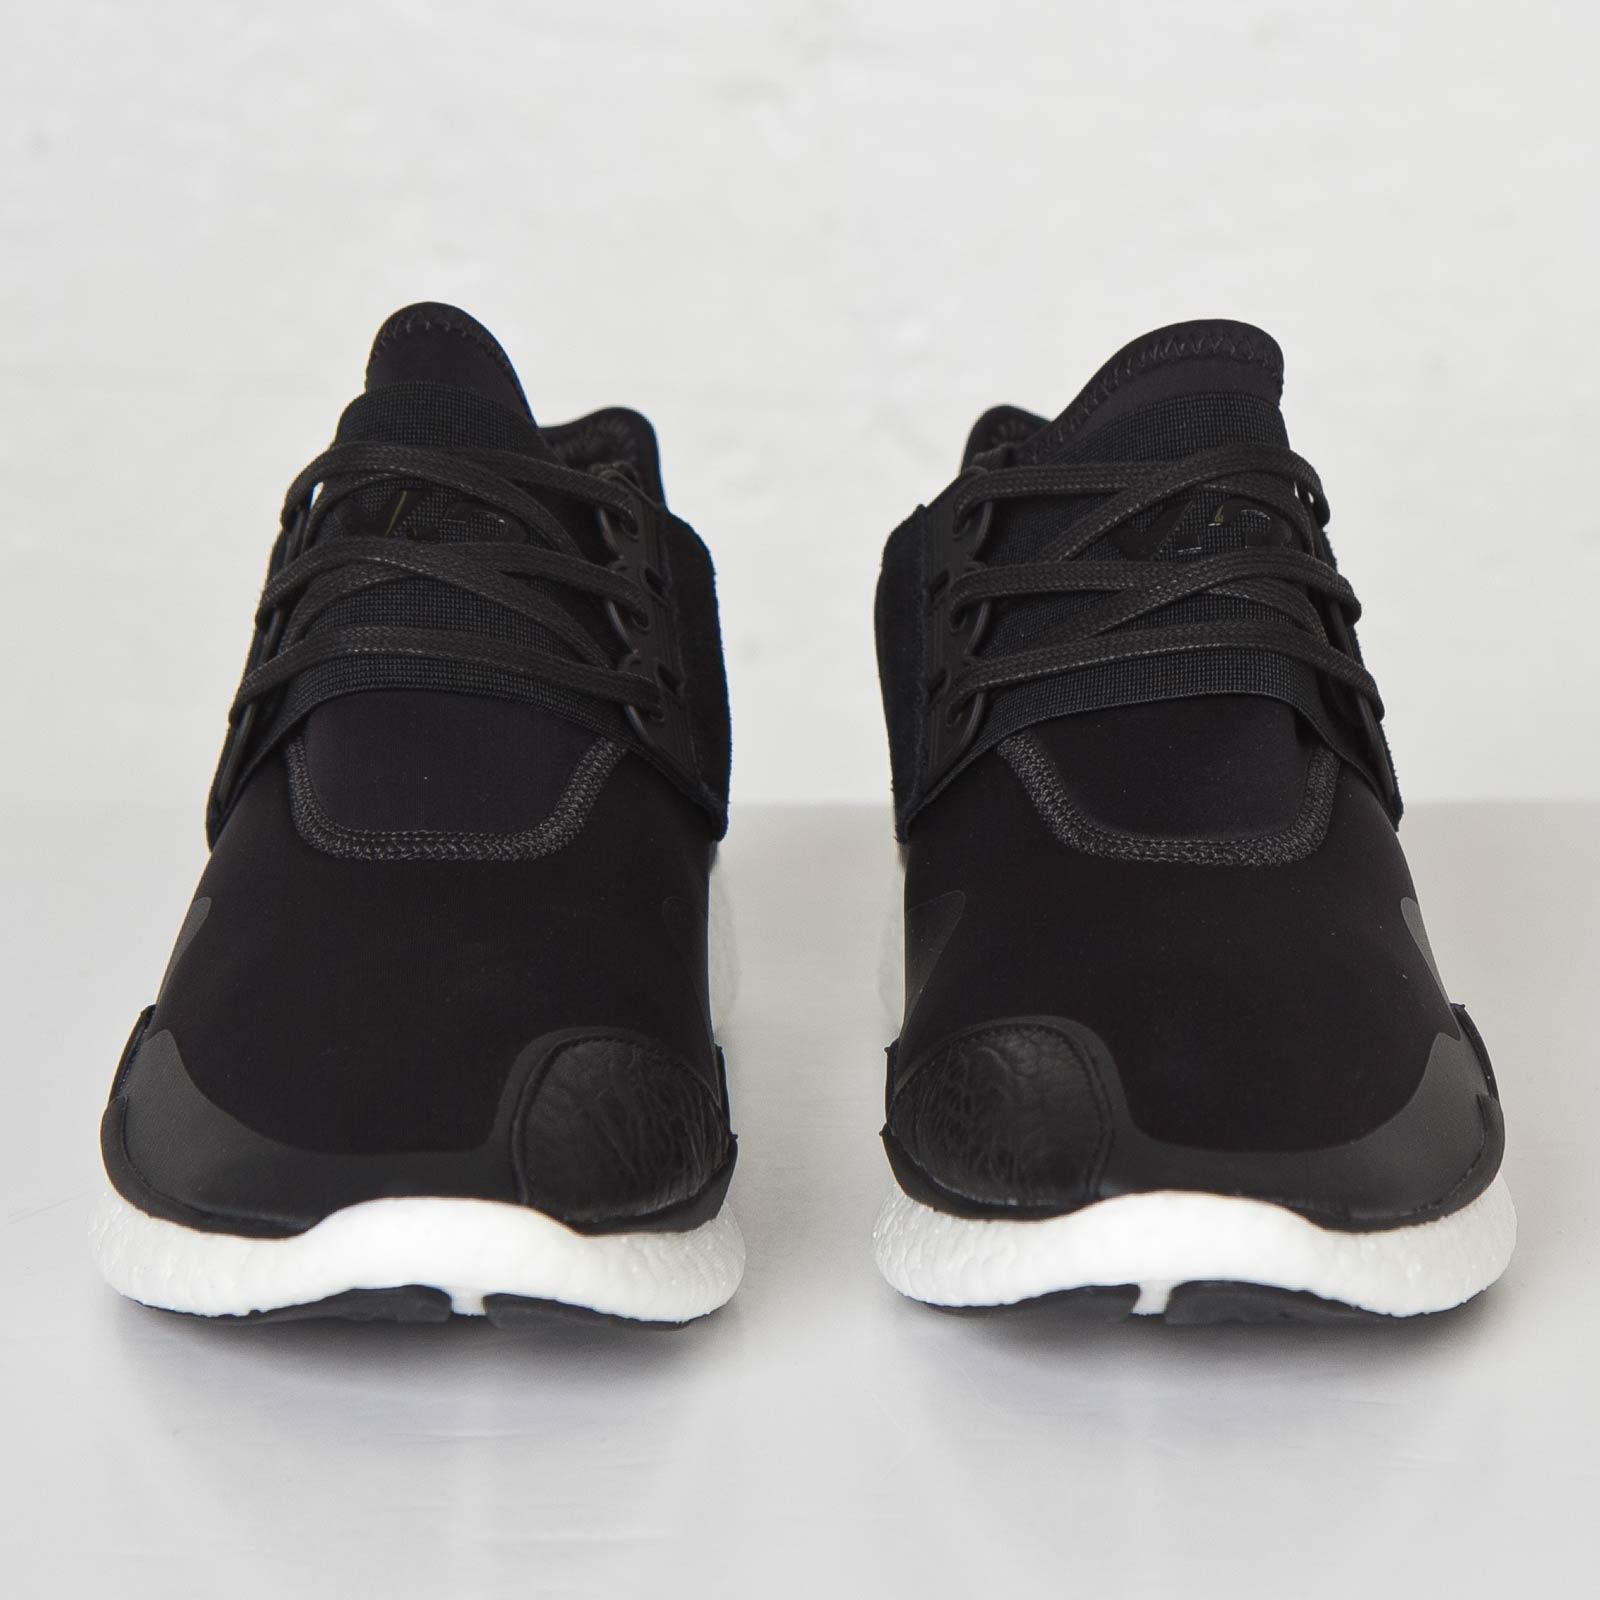 reputable site 29a22 ca7f0 adidas Y-3 Retro Boost - S83256 - Sneakersnstuff   sneakers   streetwear  online since 1999